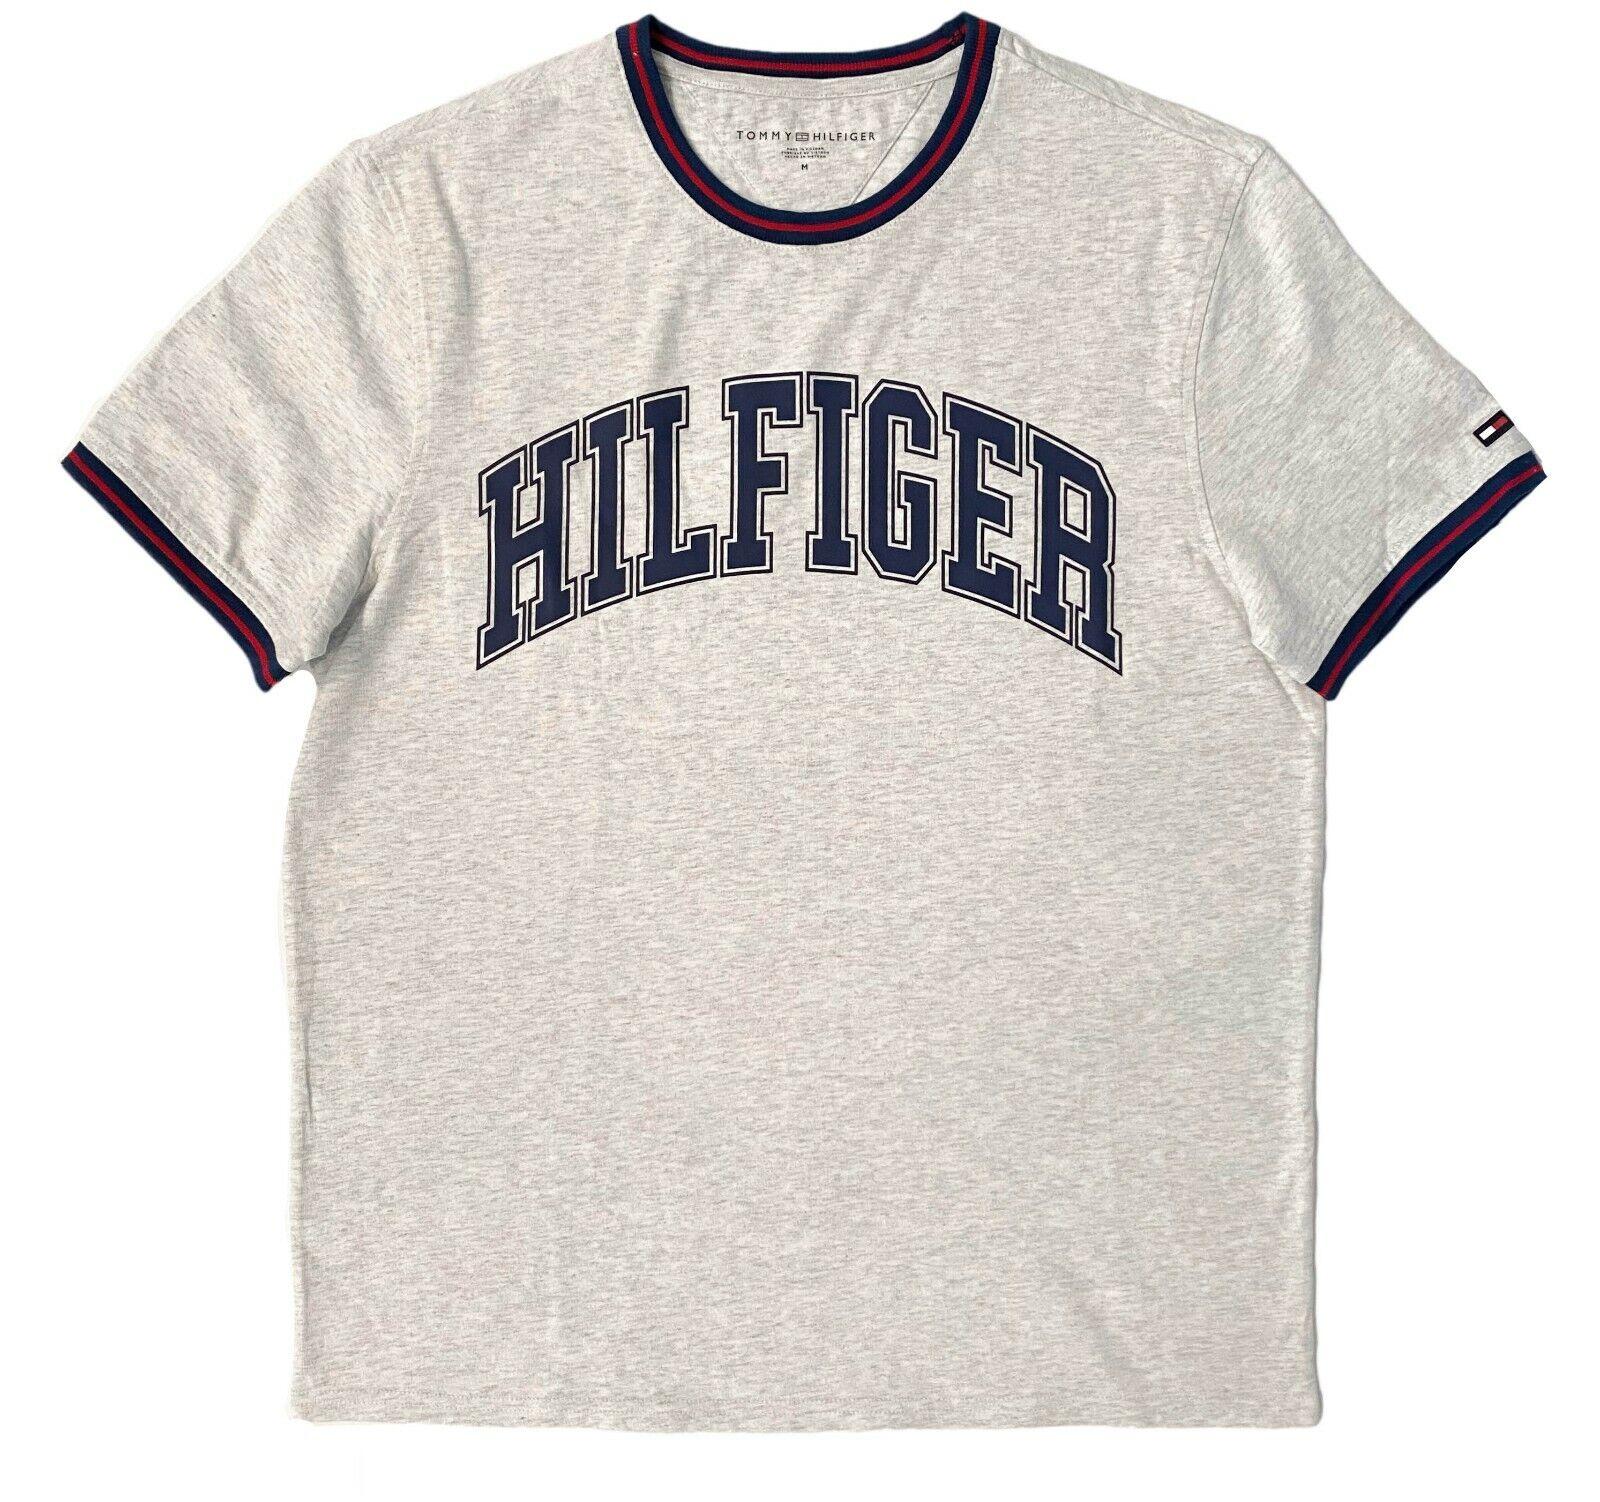 Mens Tommy Hilfiger Logo Print T-Shirt Red Navy Blue Grey Tee NEW - $15.00